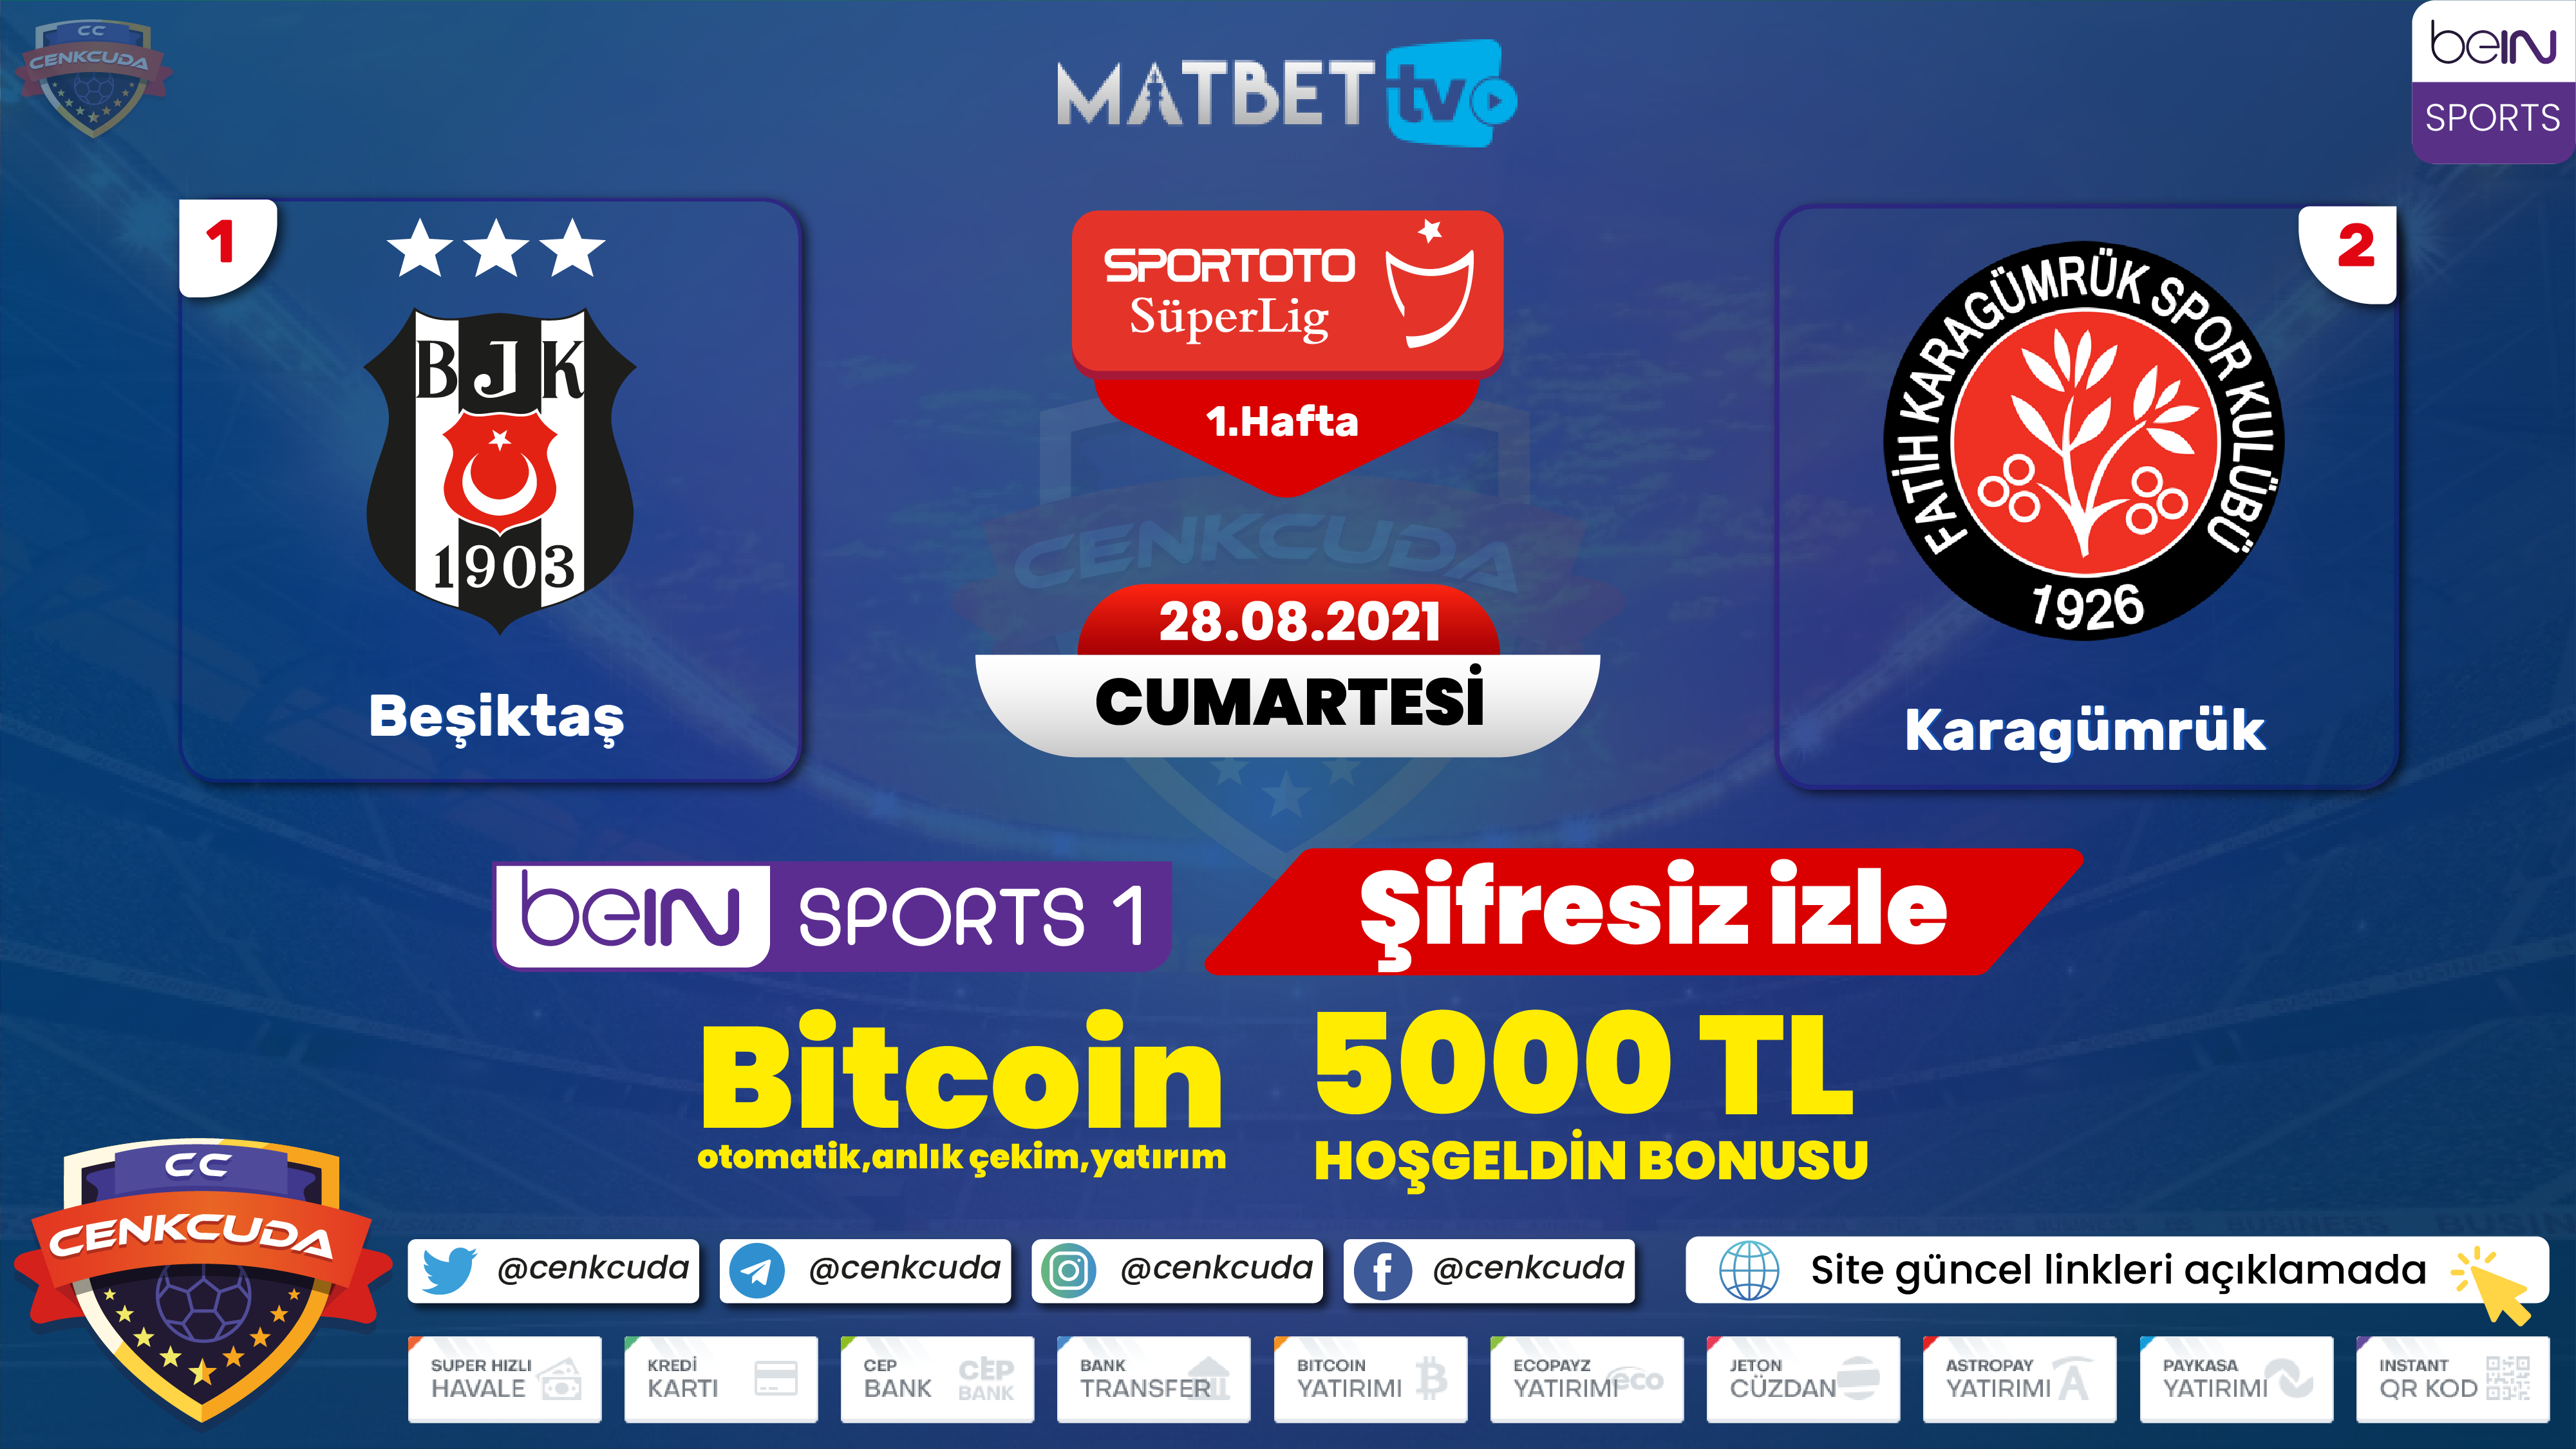 Beşiktaş Fatih Karagümrük